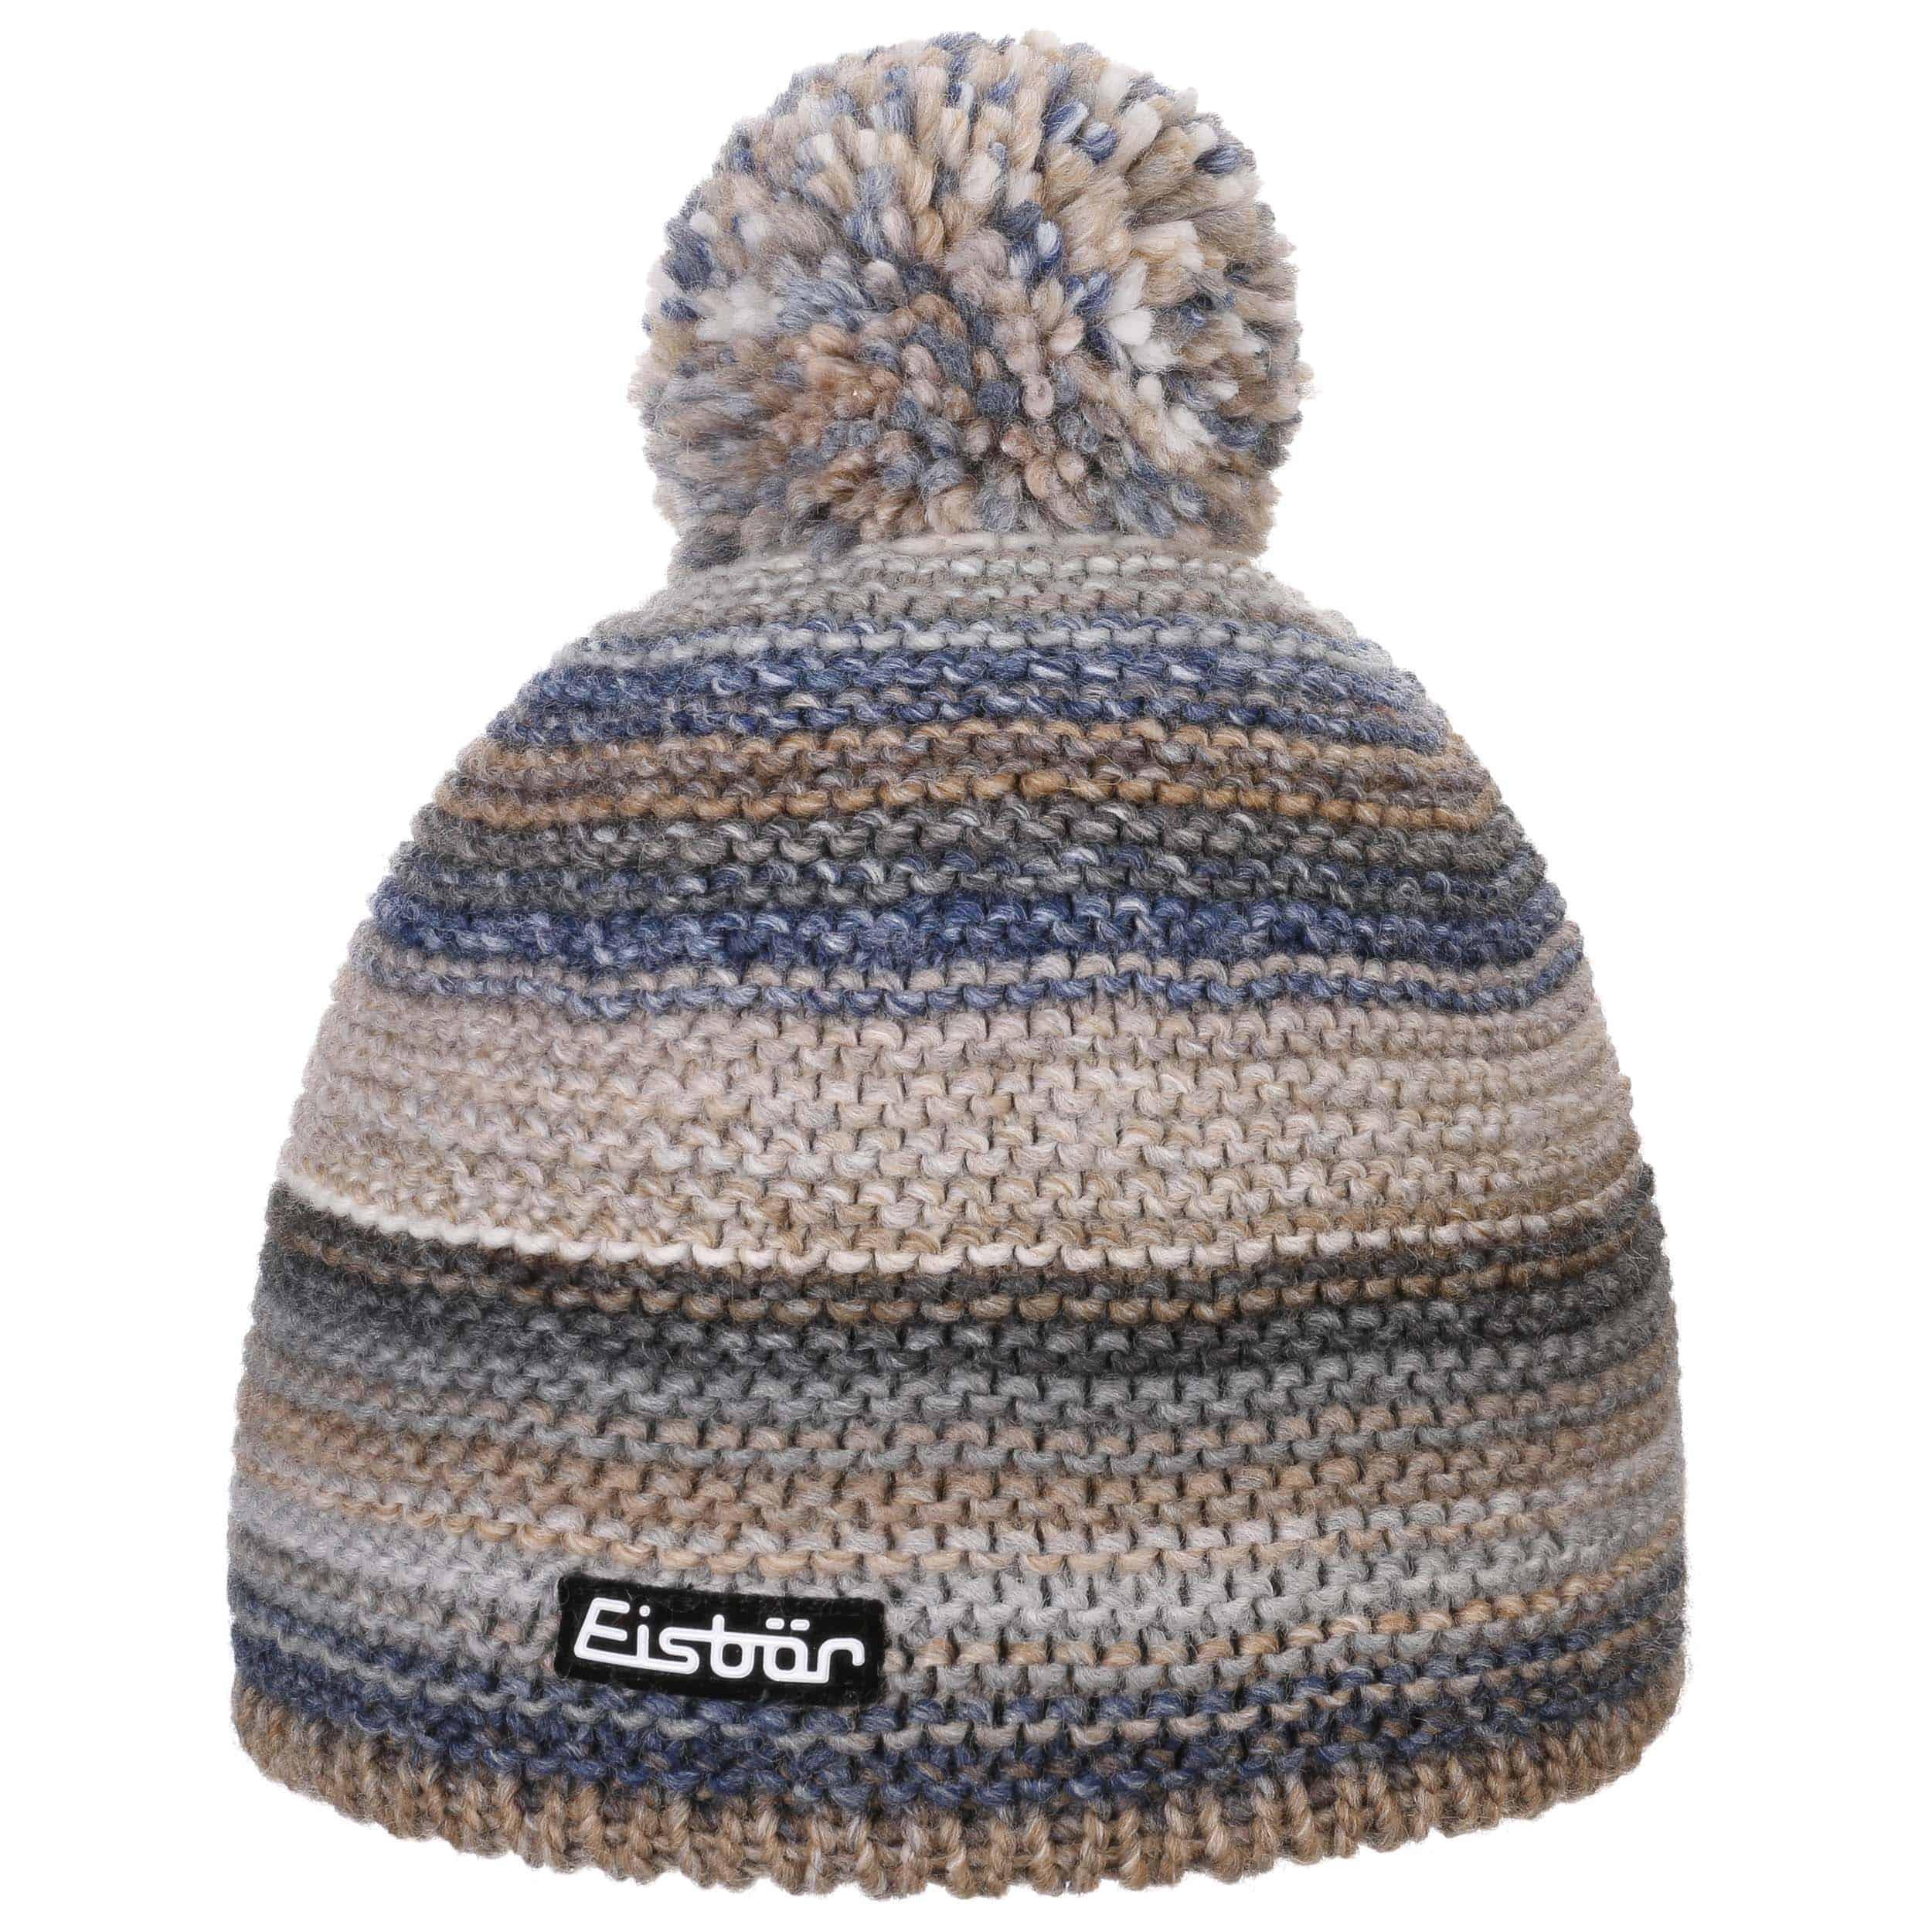 ... Kunita Pom Pom Hat by Eisbär - beige-blue 4 ... 8b464c70bc1